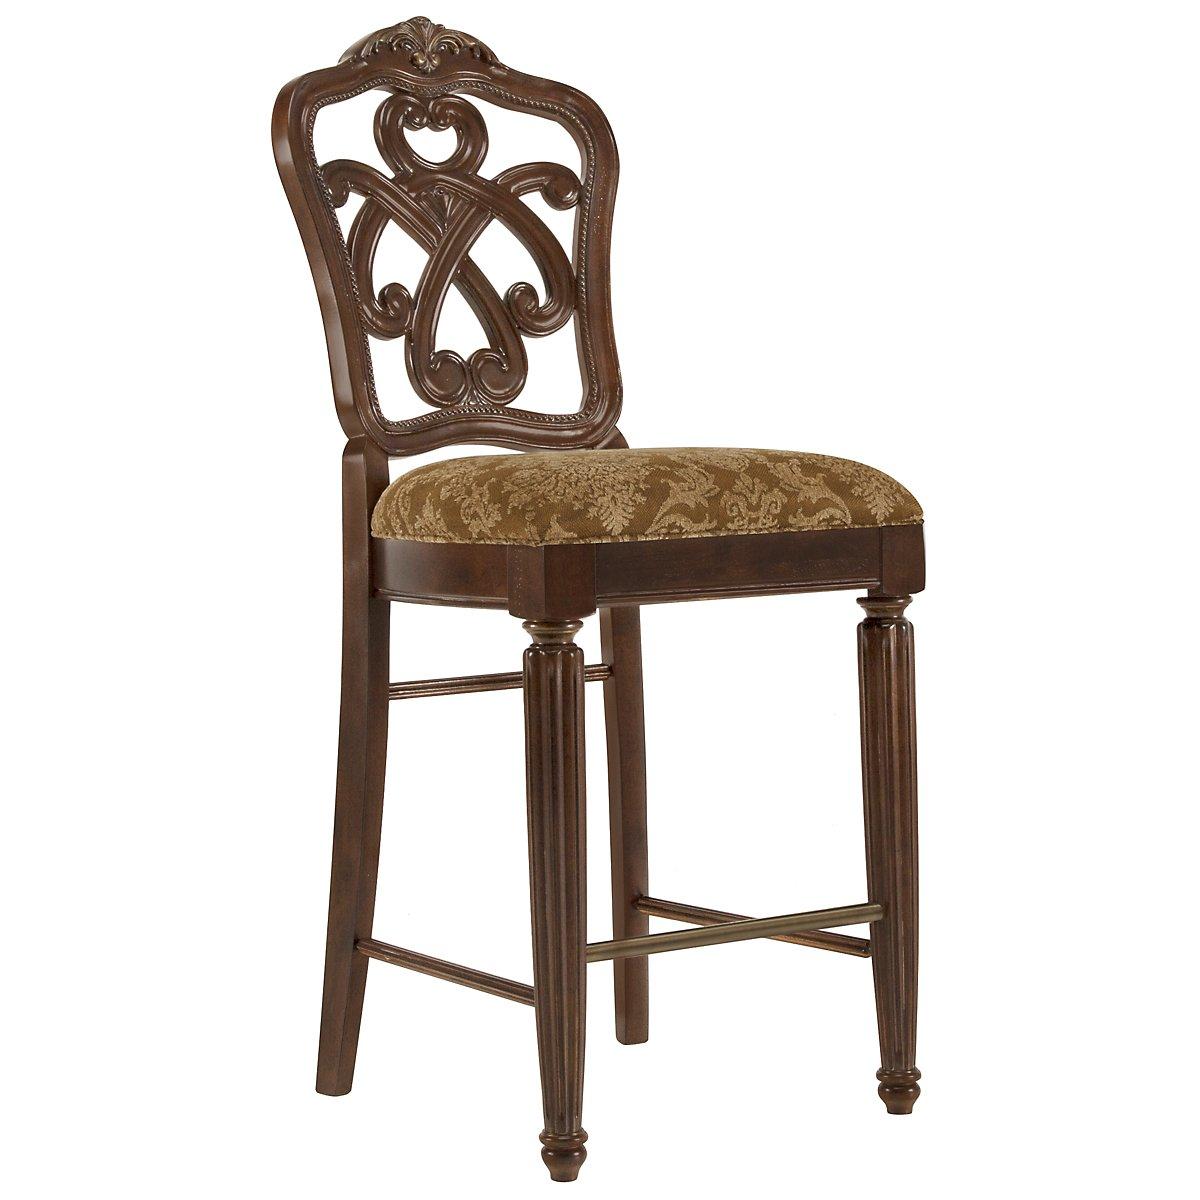 "Regal Dark Tone 30"" Wood Barstool"